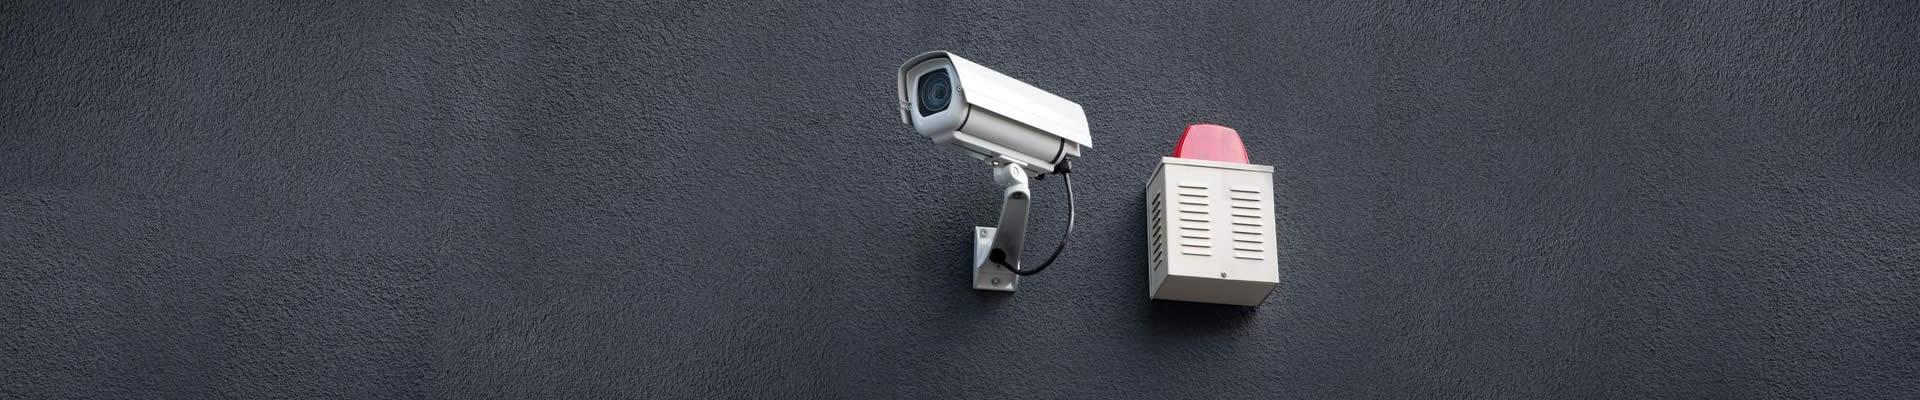 videoüberwachung_slider